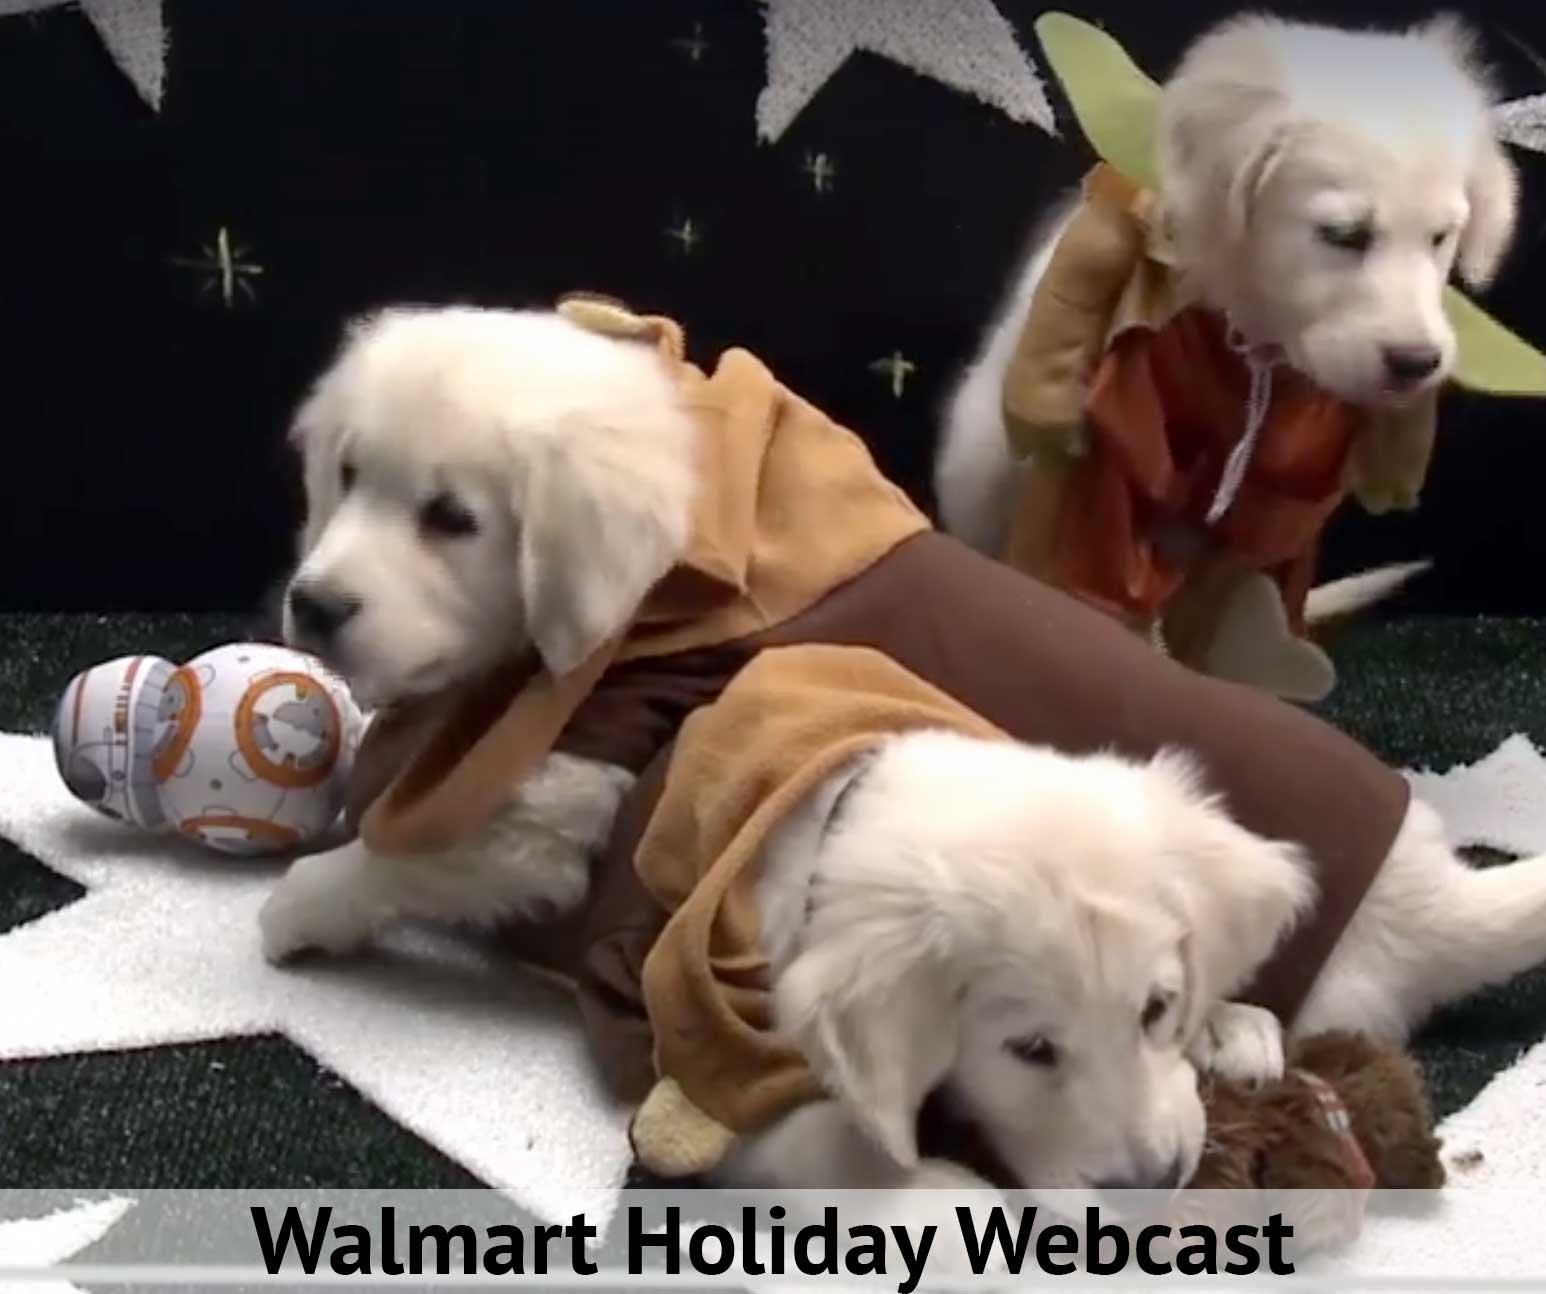 Walmart WebCasts Holiday Prep Advice 1